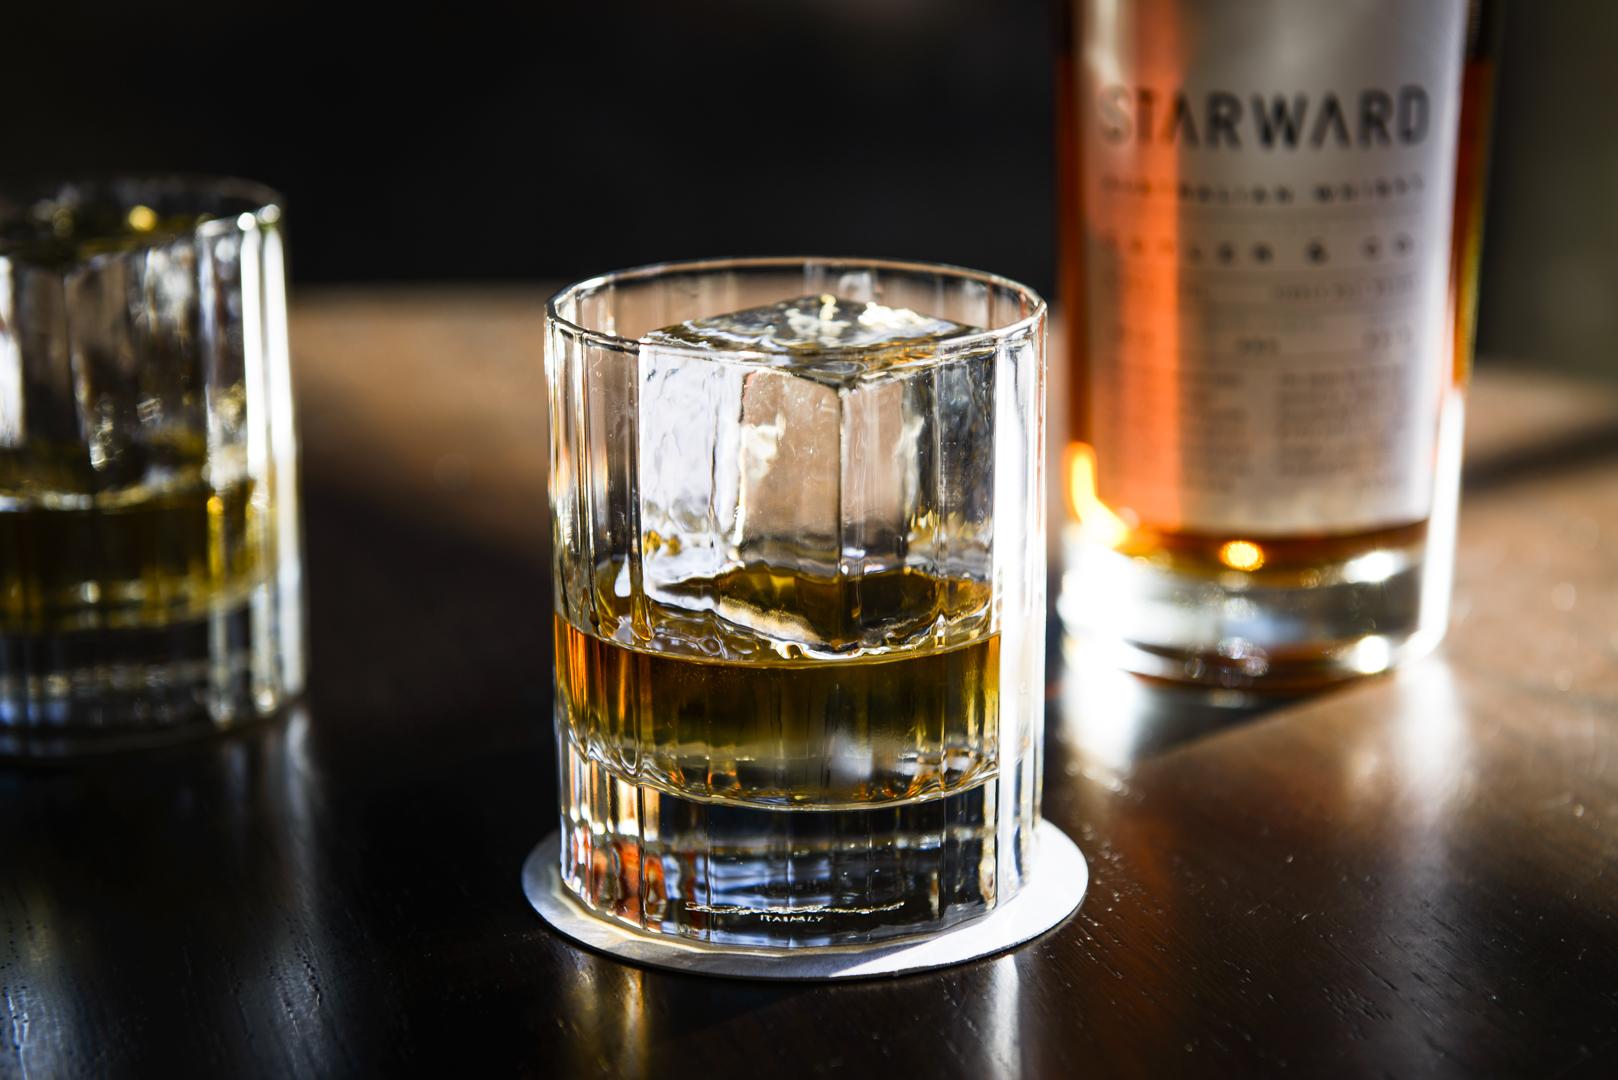 Starward 'Cutler & Co. Project' whisky